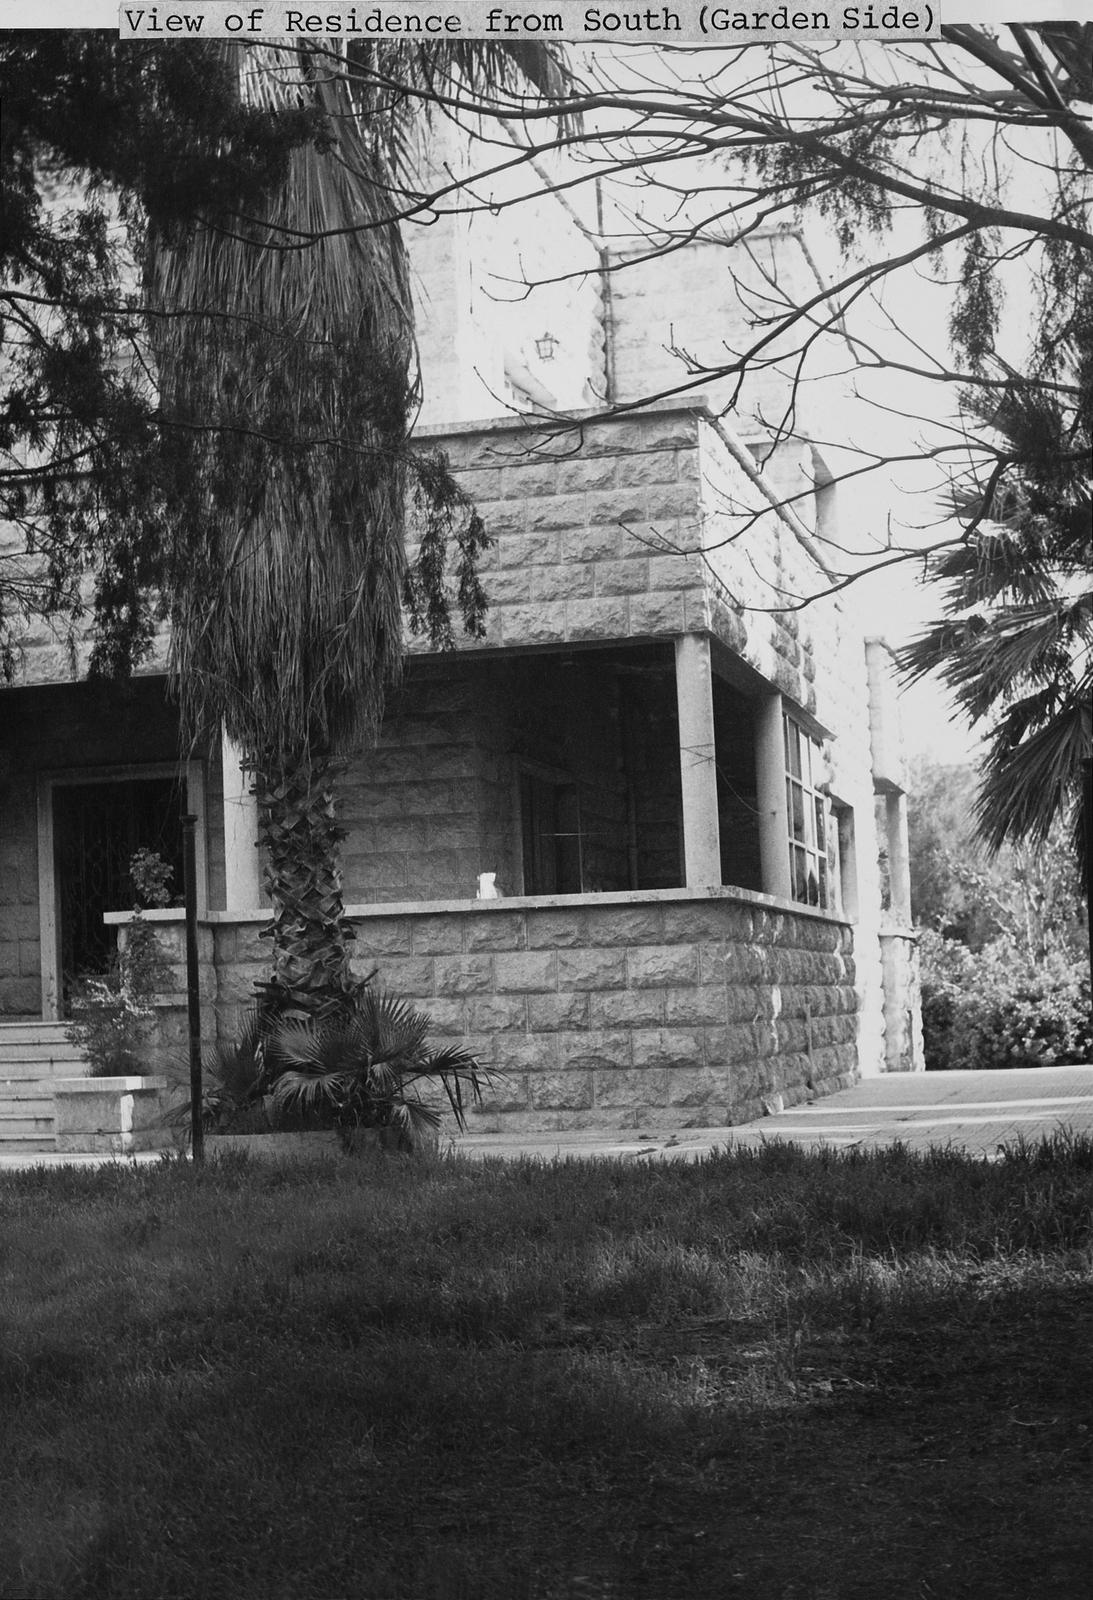 Damascus - Annex Office Building - 1978